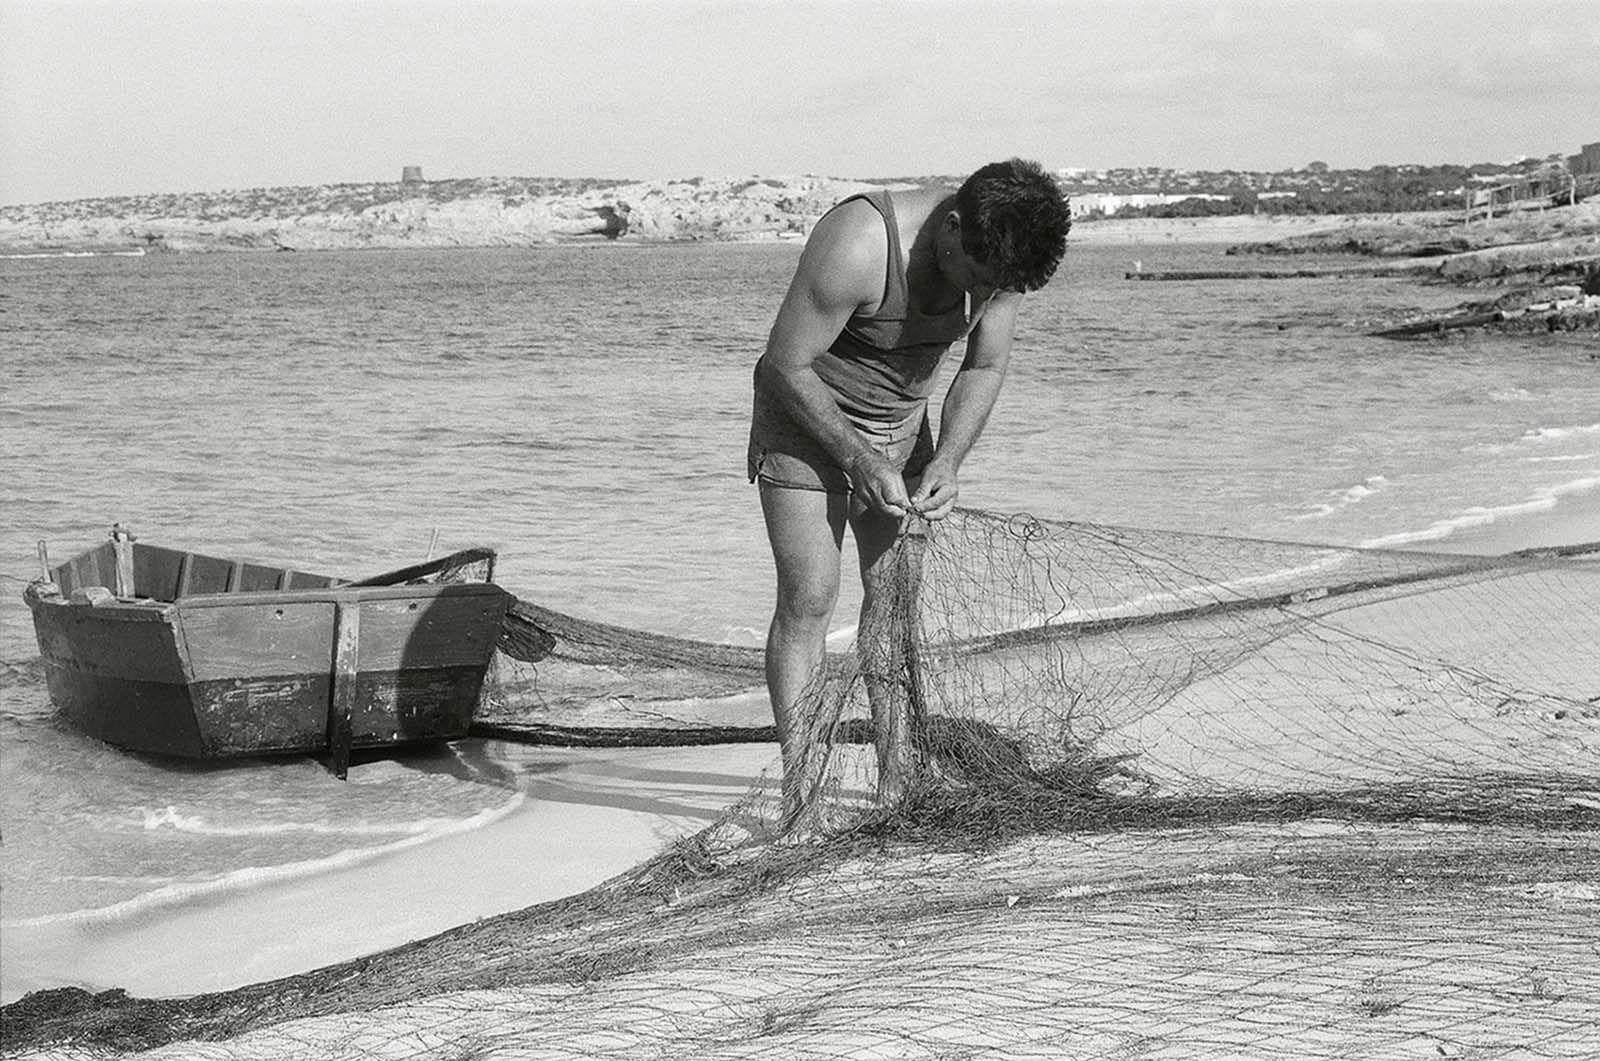 El concurso de fotos Beni Trutmann reúne a 51 participantes